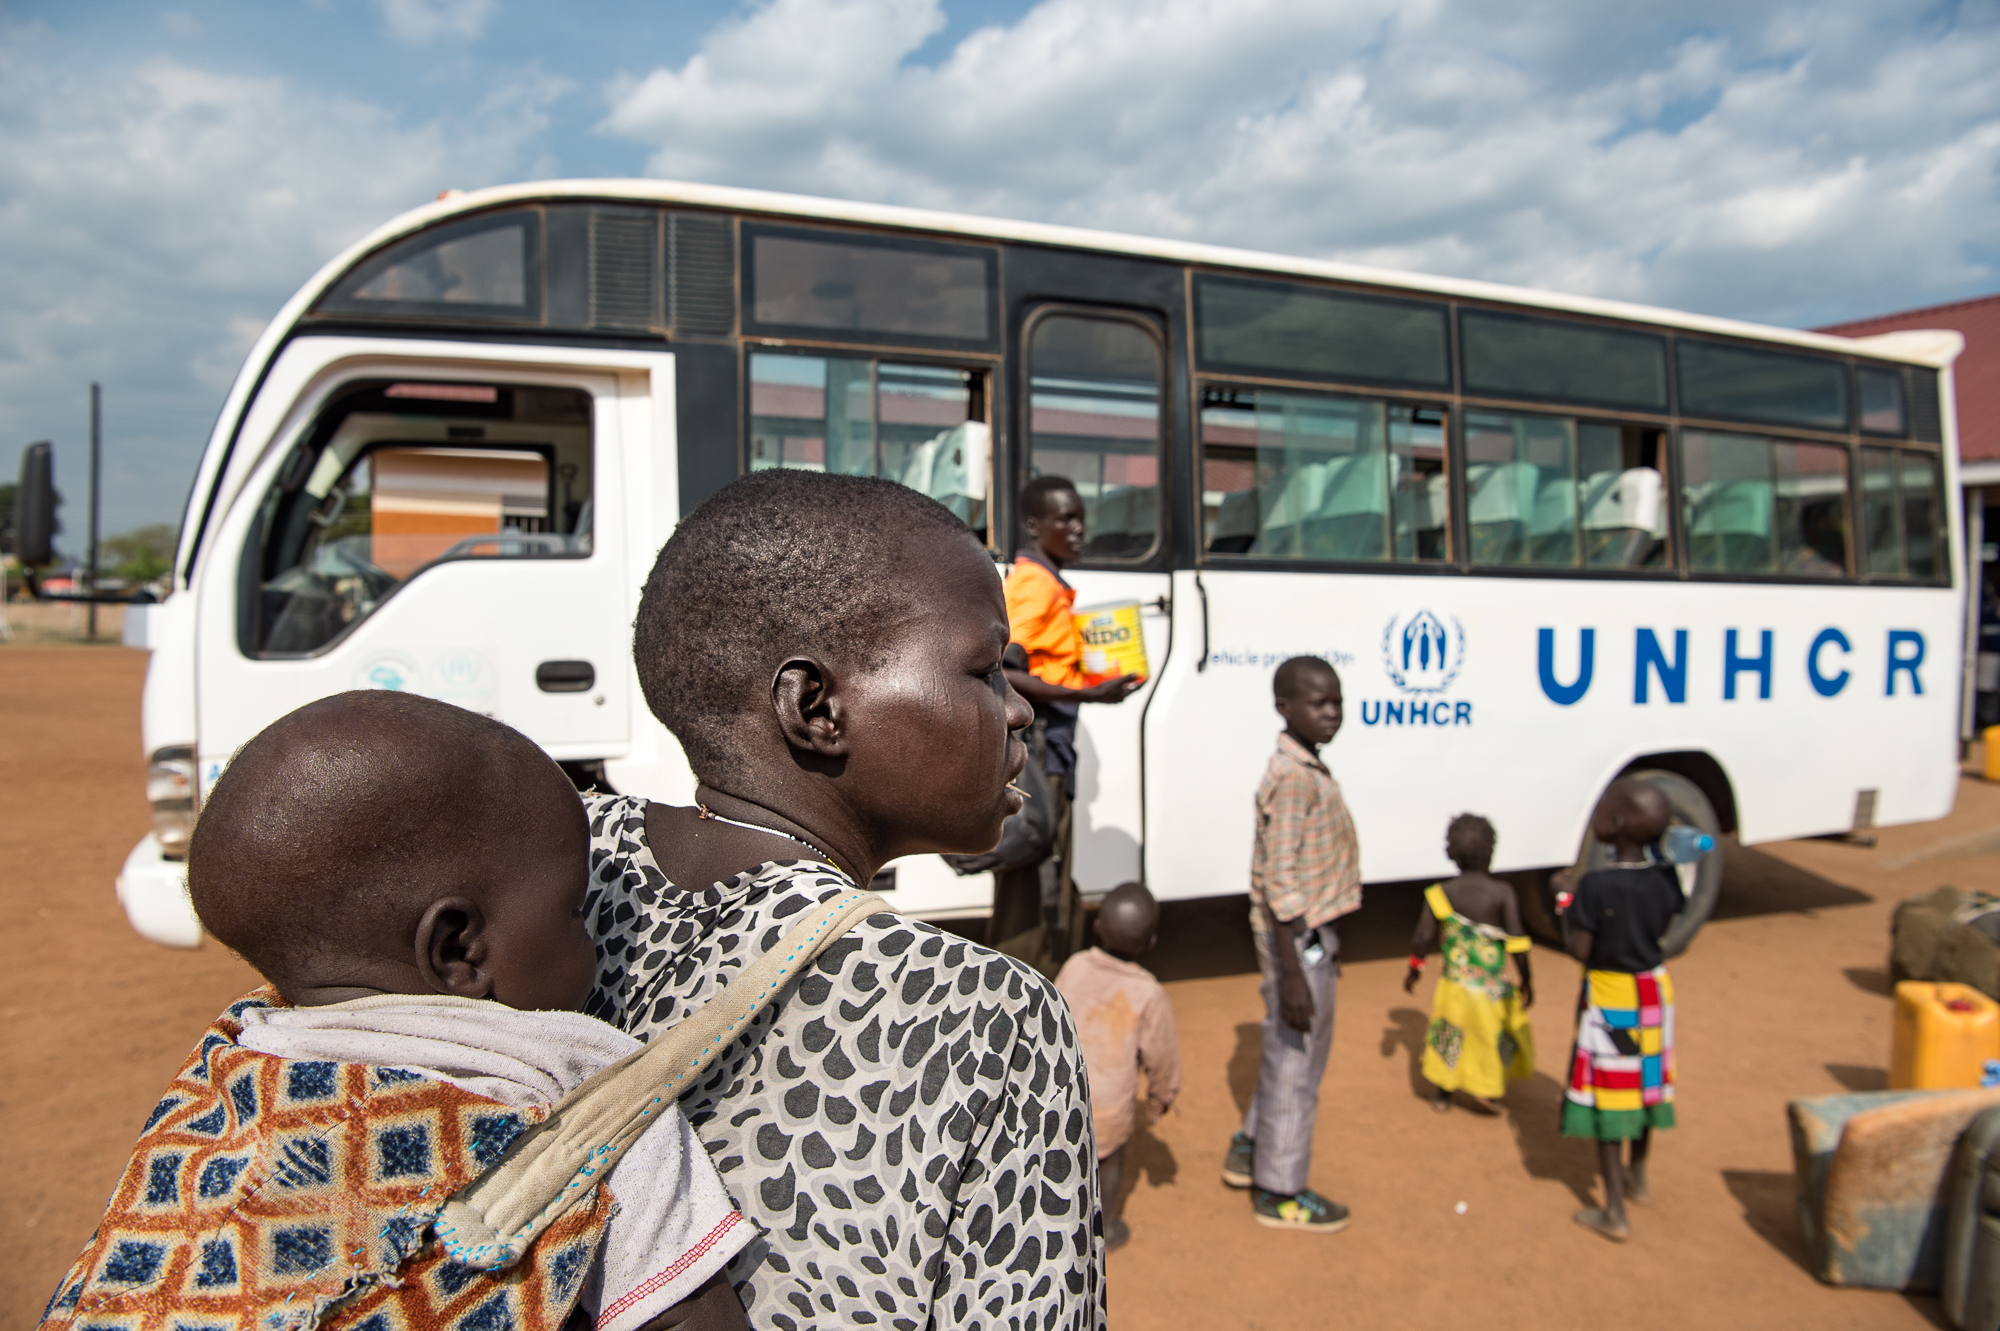 AE_SS16_UNICEF__11757.jpg